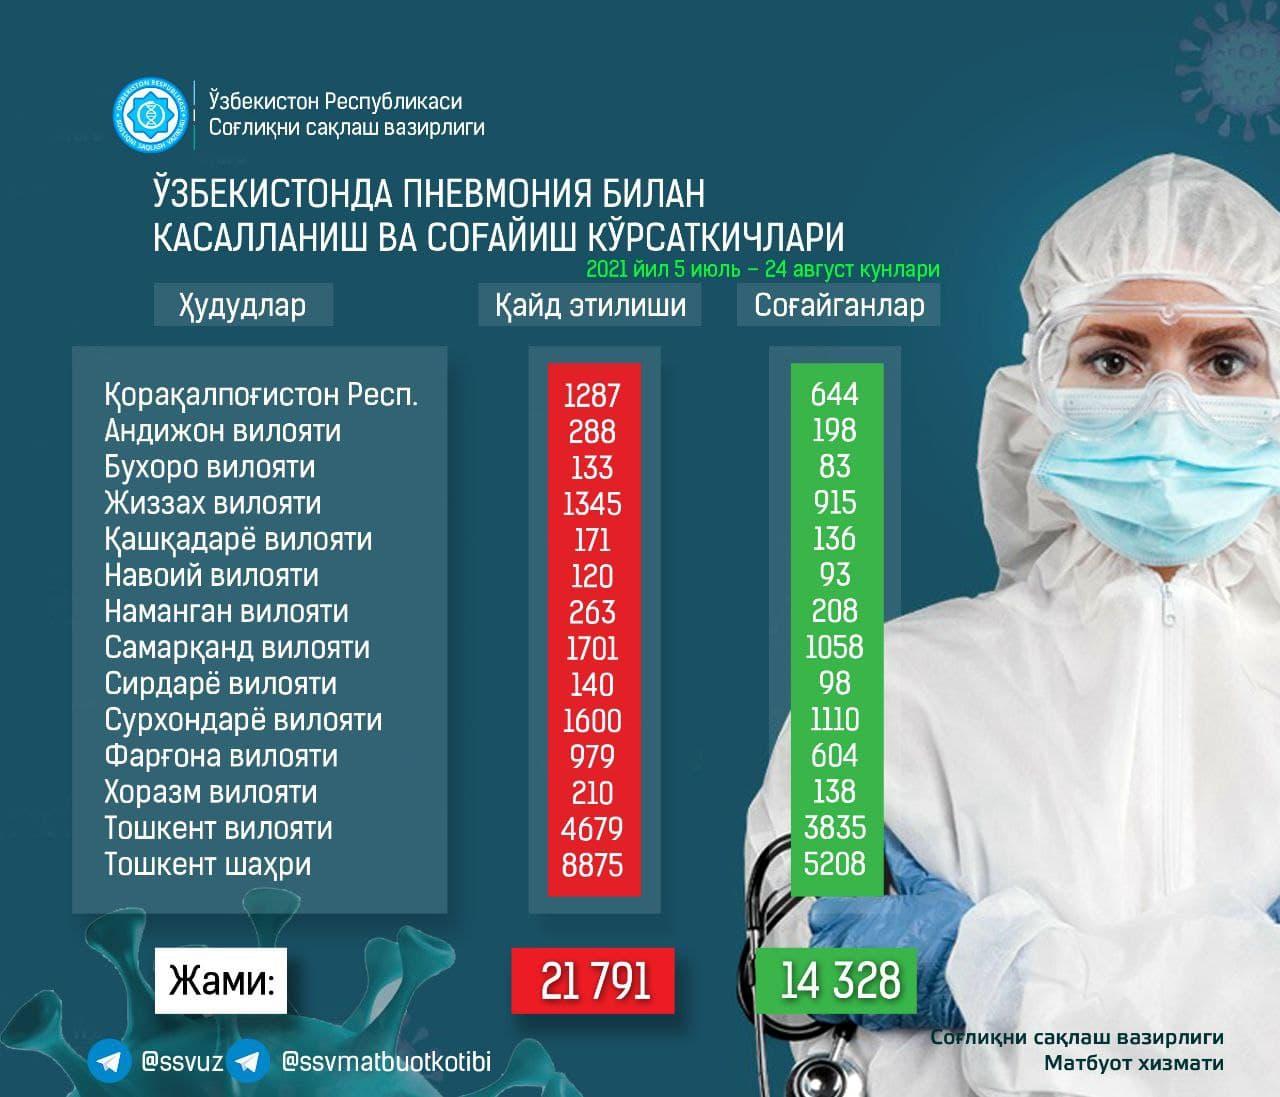 Общее число смертей от пневмонии перевалило за 150 — статистика